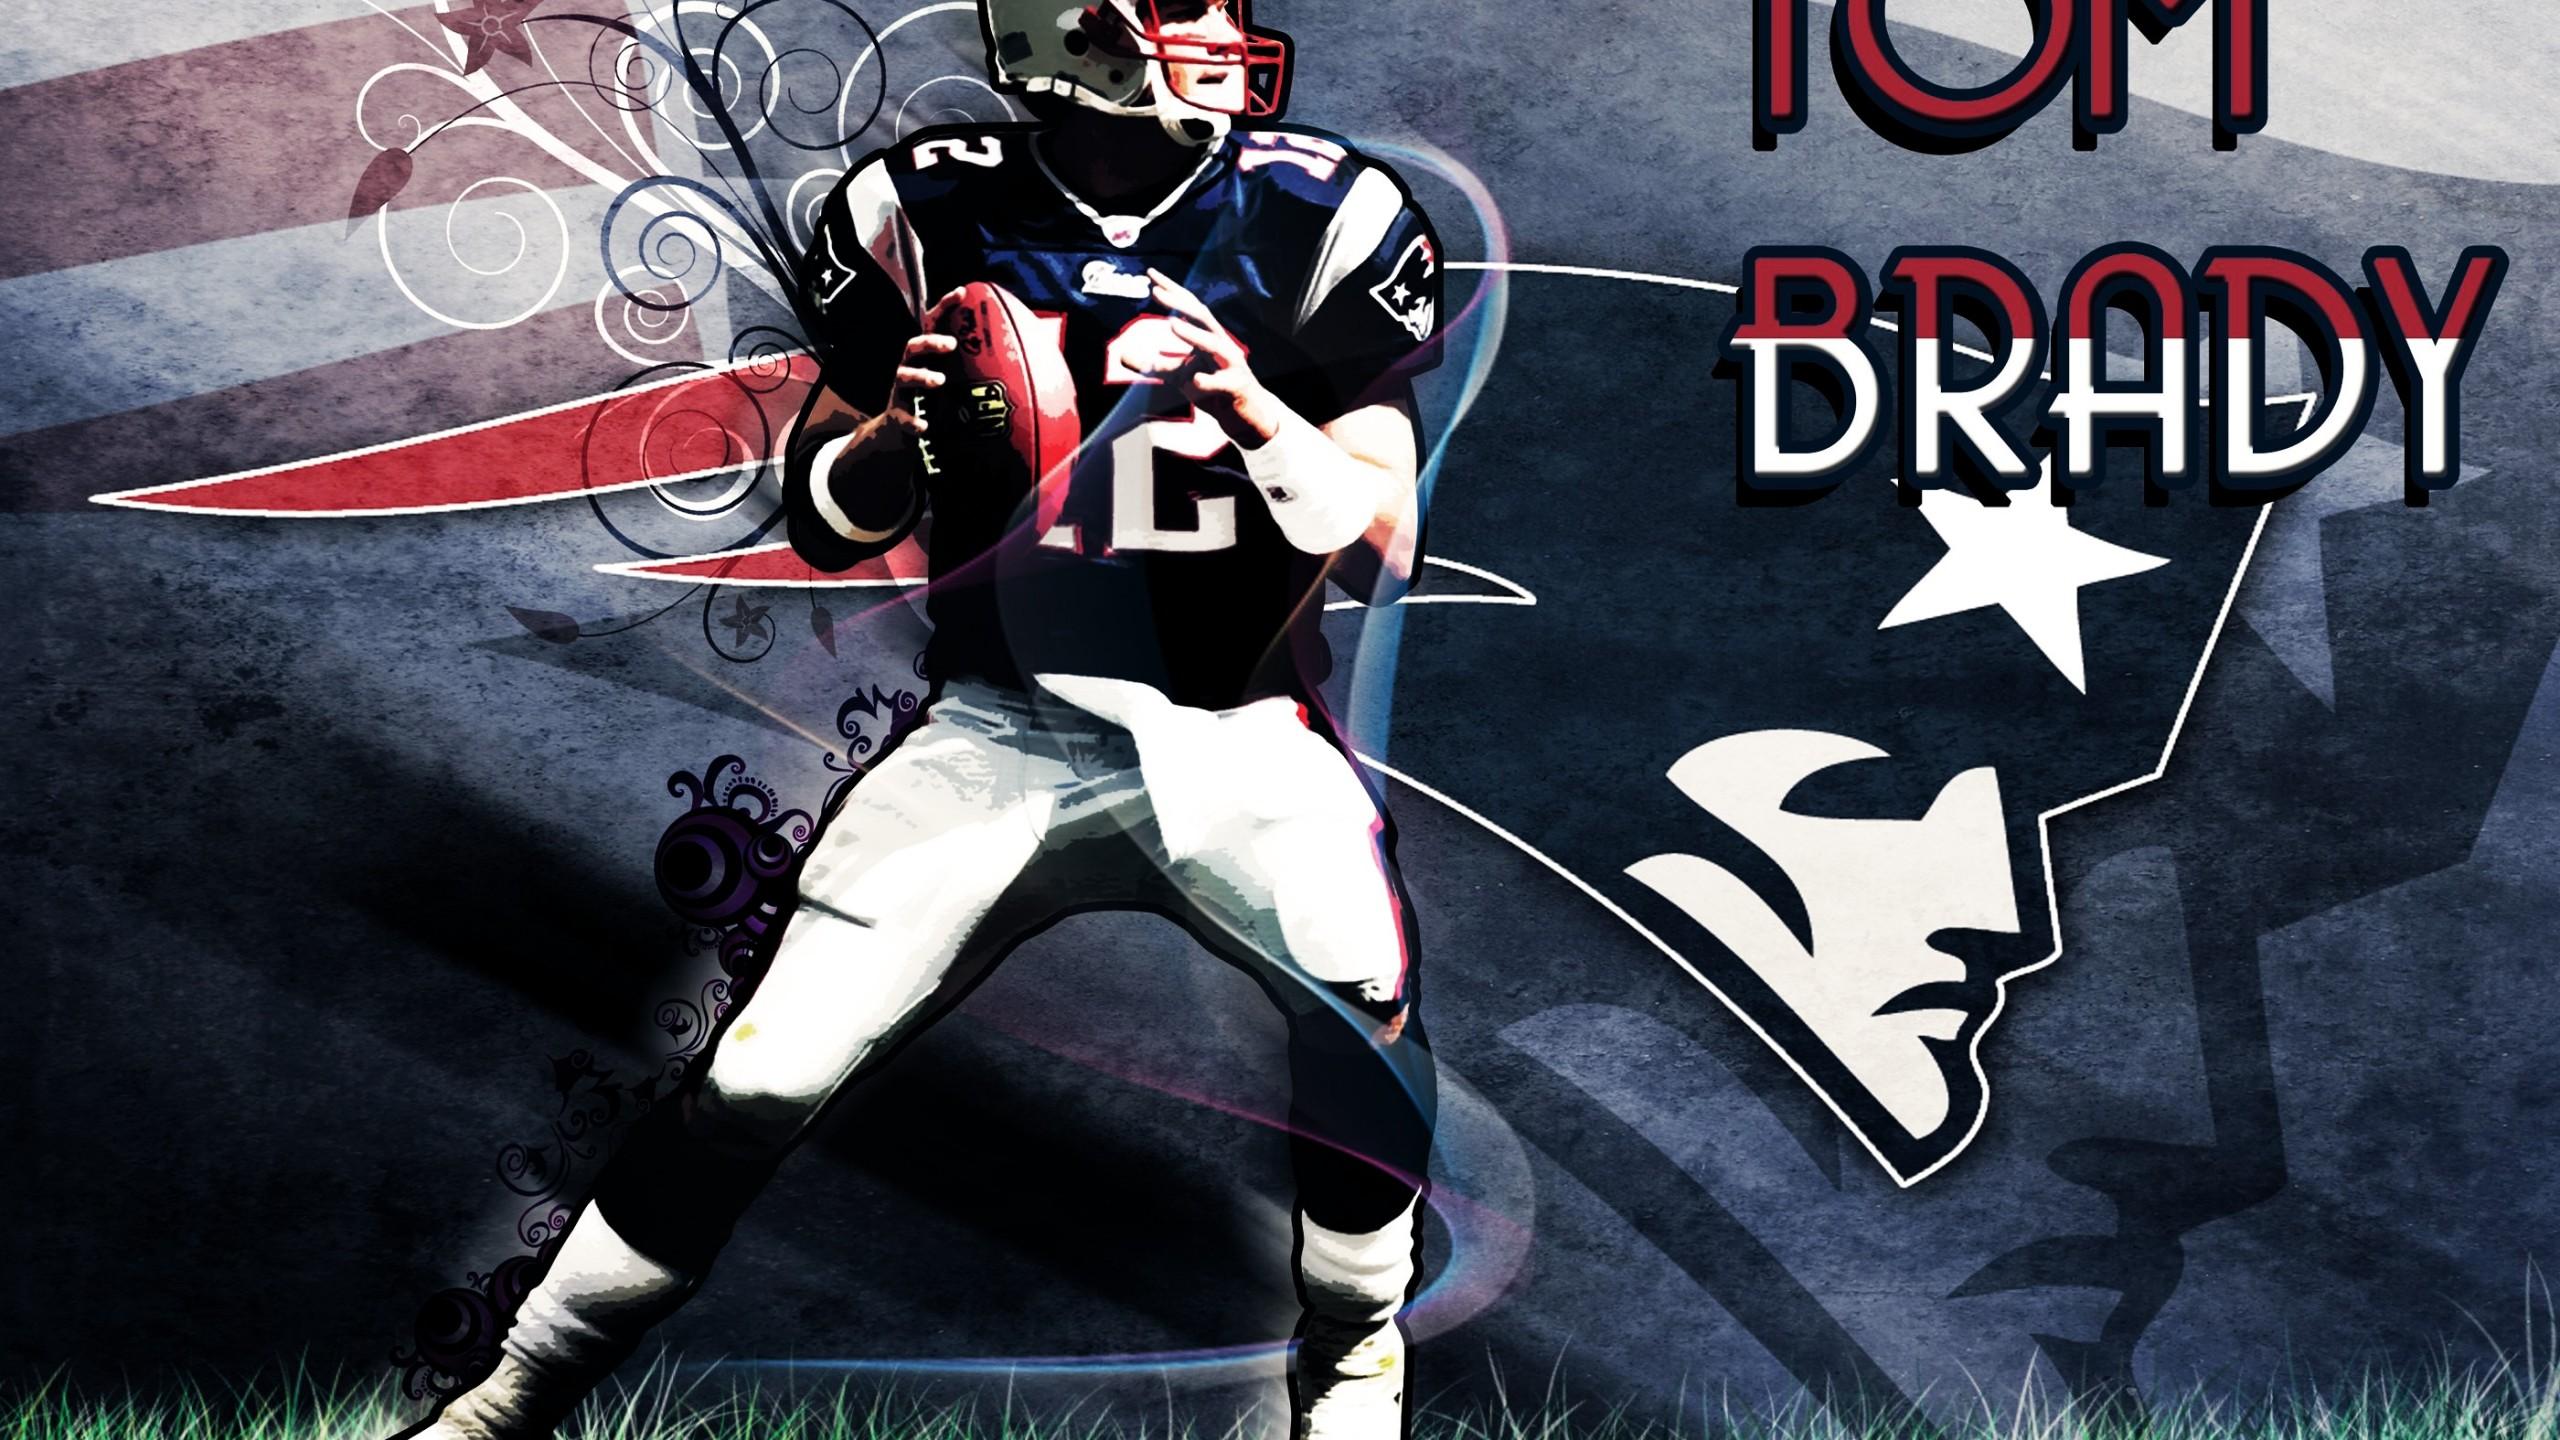 Tom Brady Wallpaper Quote Tom Brady Wallpapers High Quality Download Free